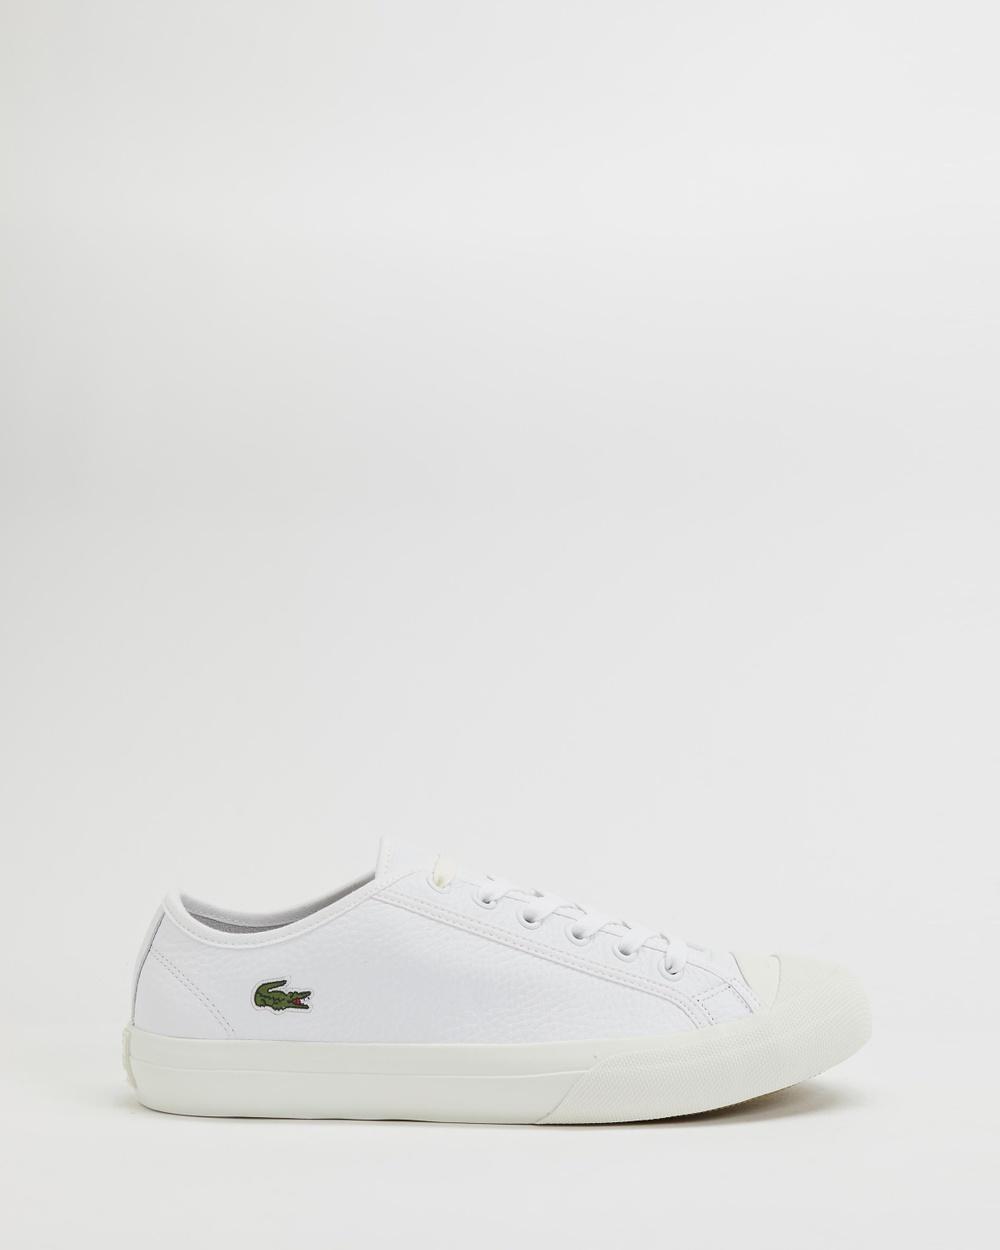 Lacoste Topskill Women's Sneakers White & Off-White